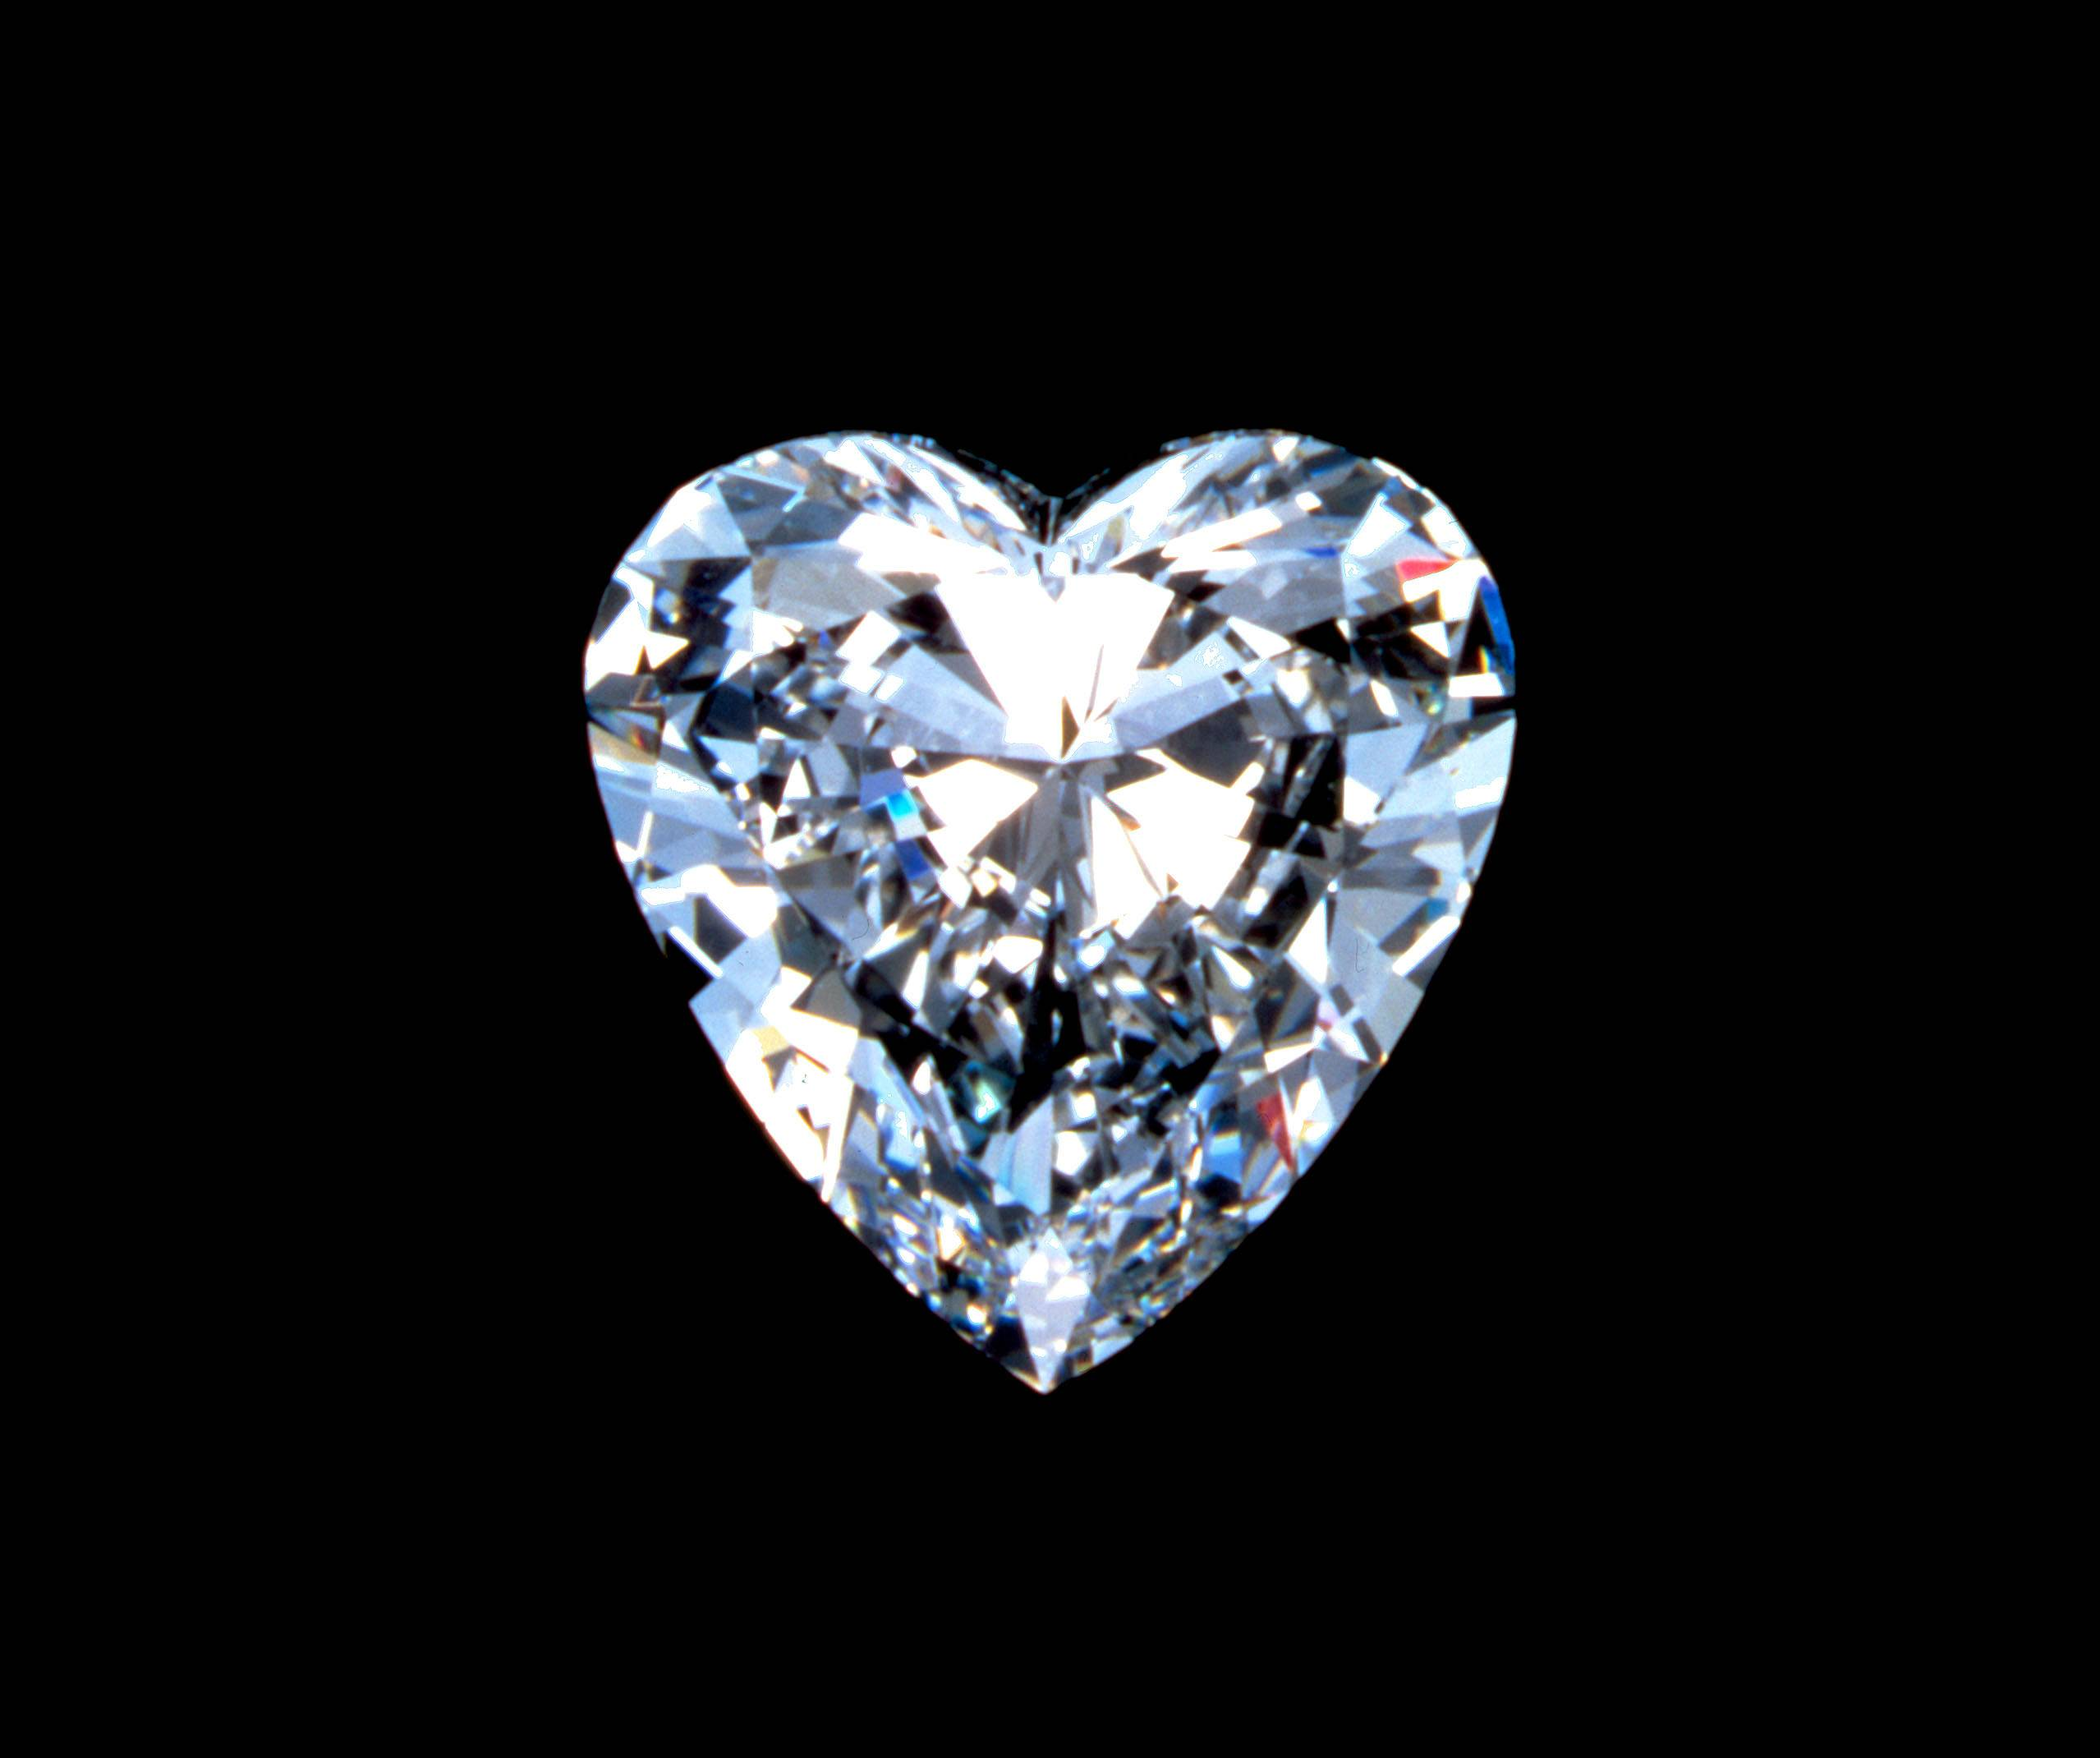 Wollpepar Diamond: Diamond Shape Wallpaper